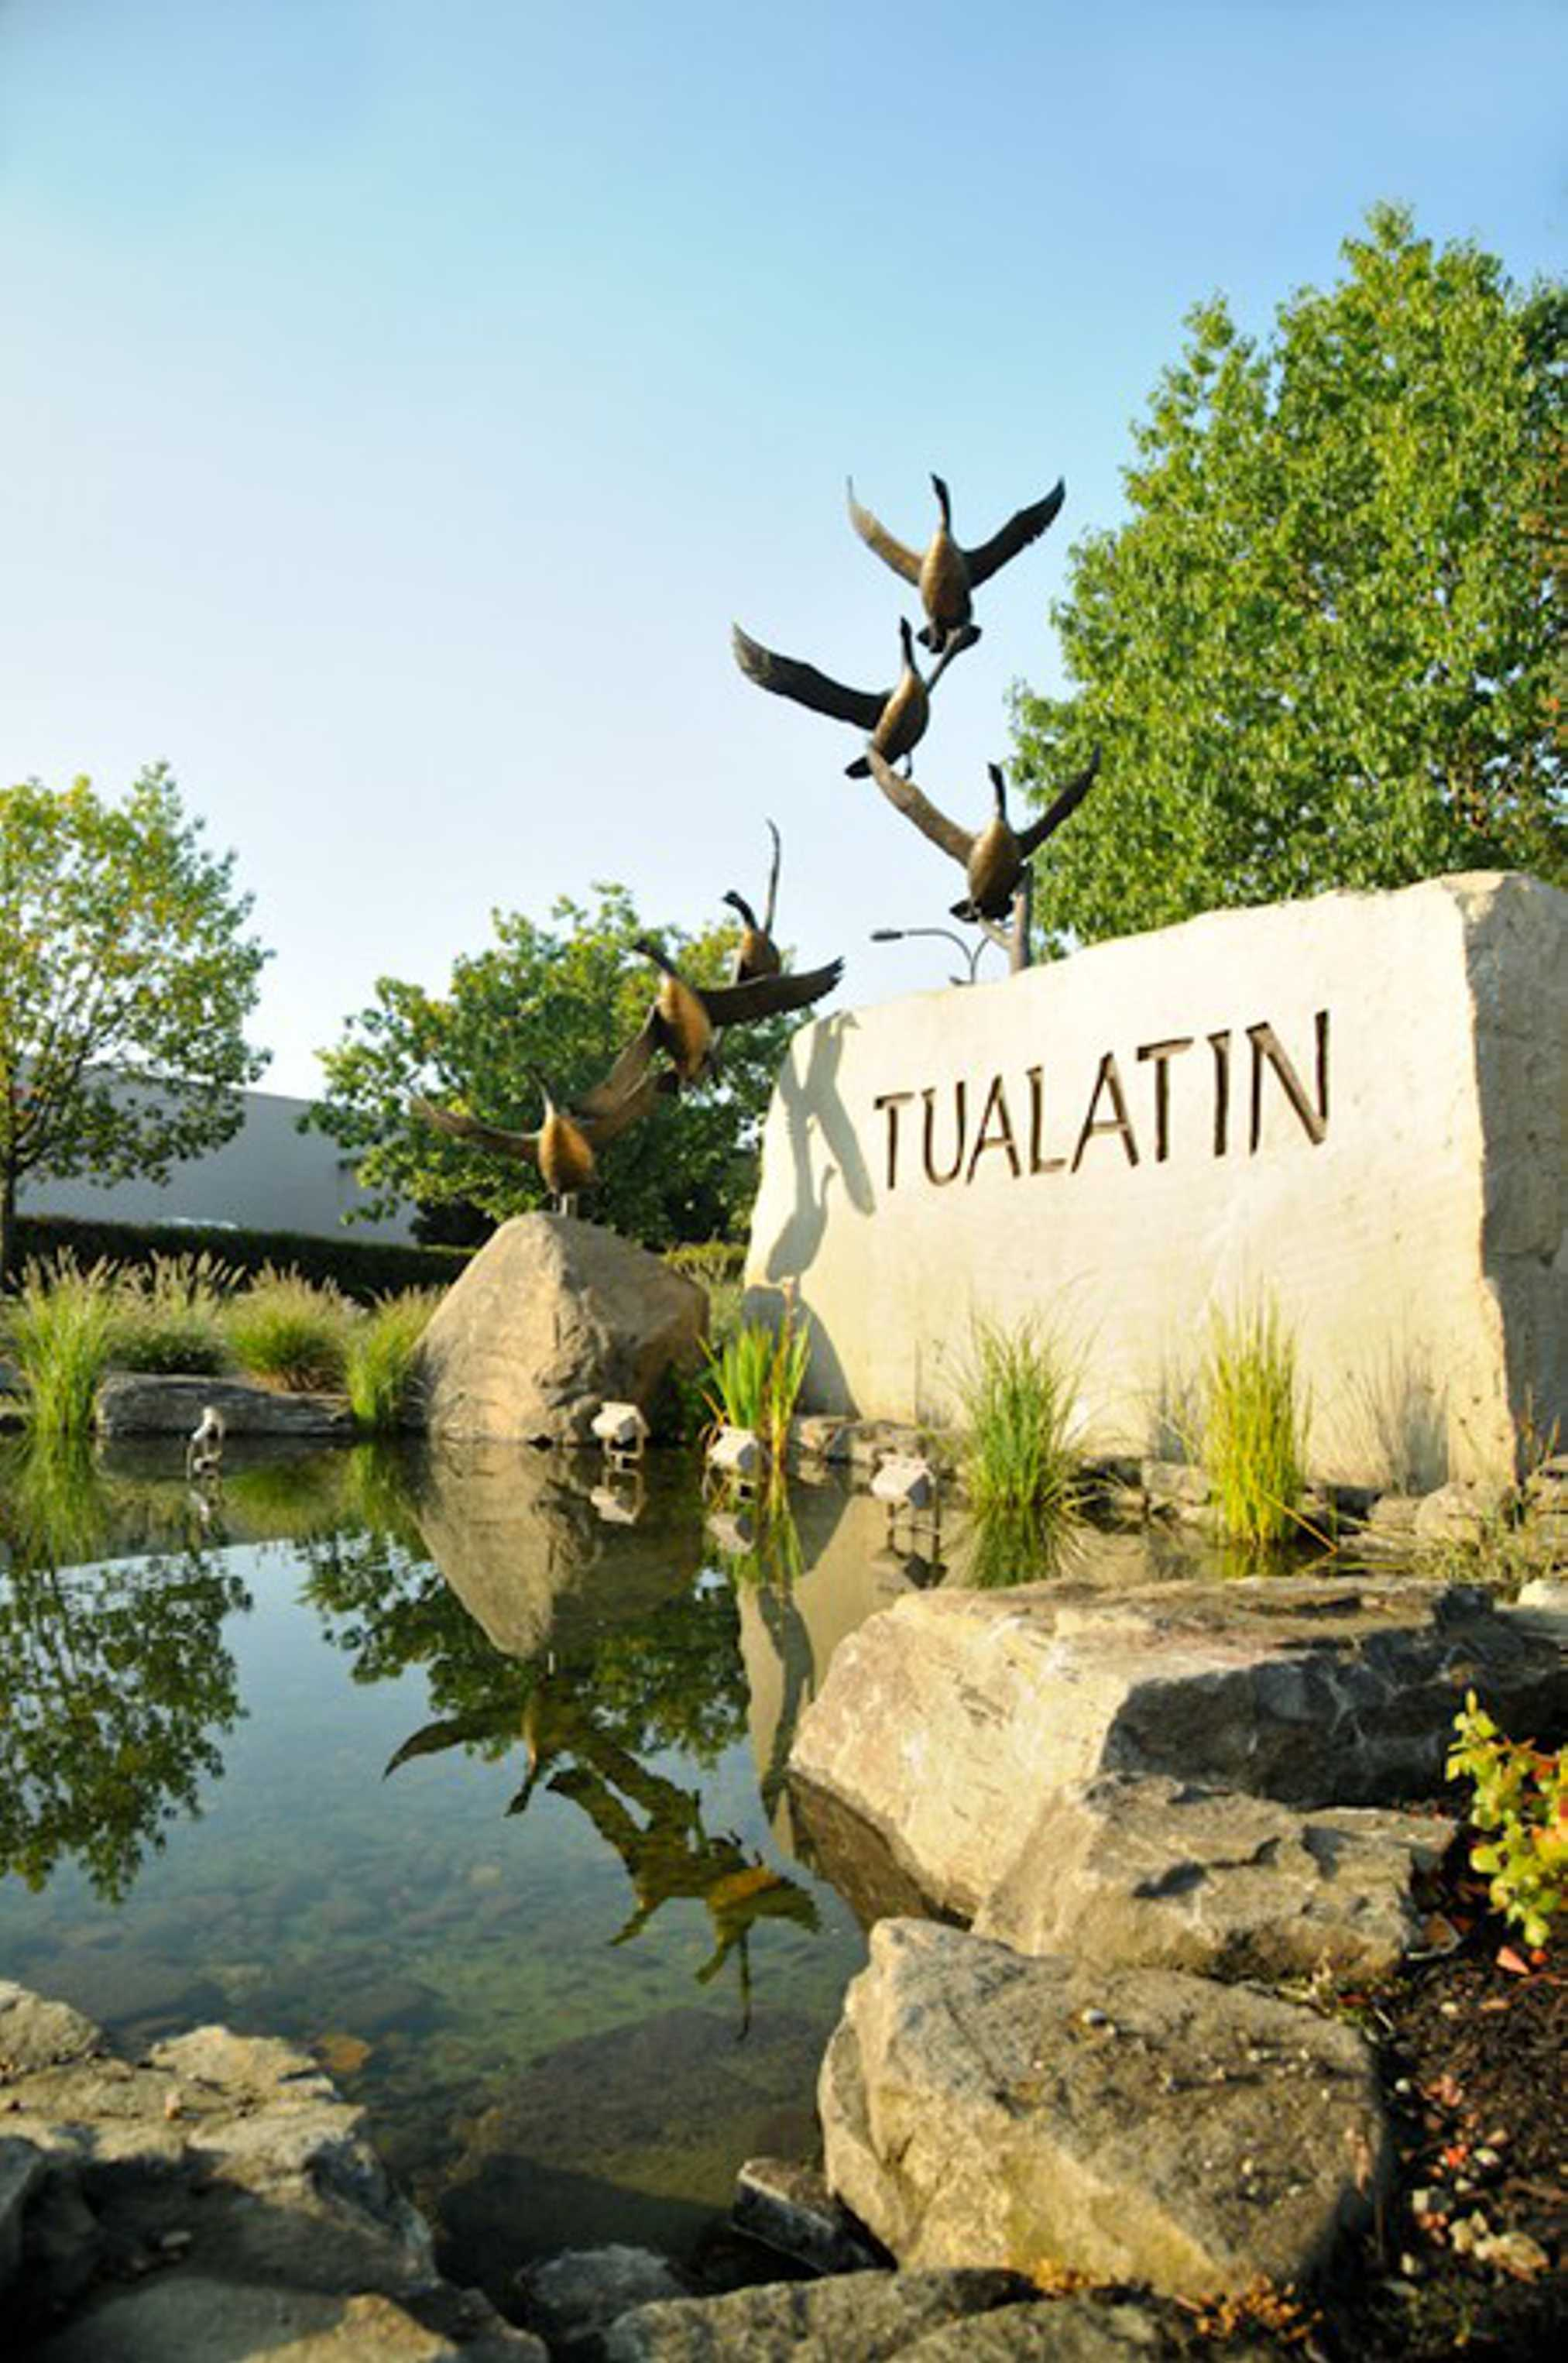 Tualatin Entry Monument Studio Art Direct